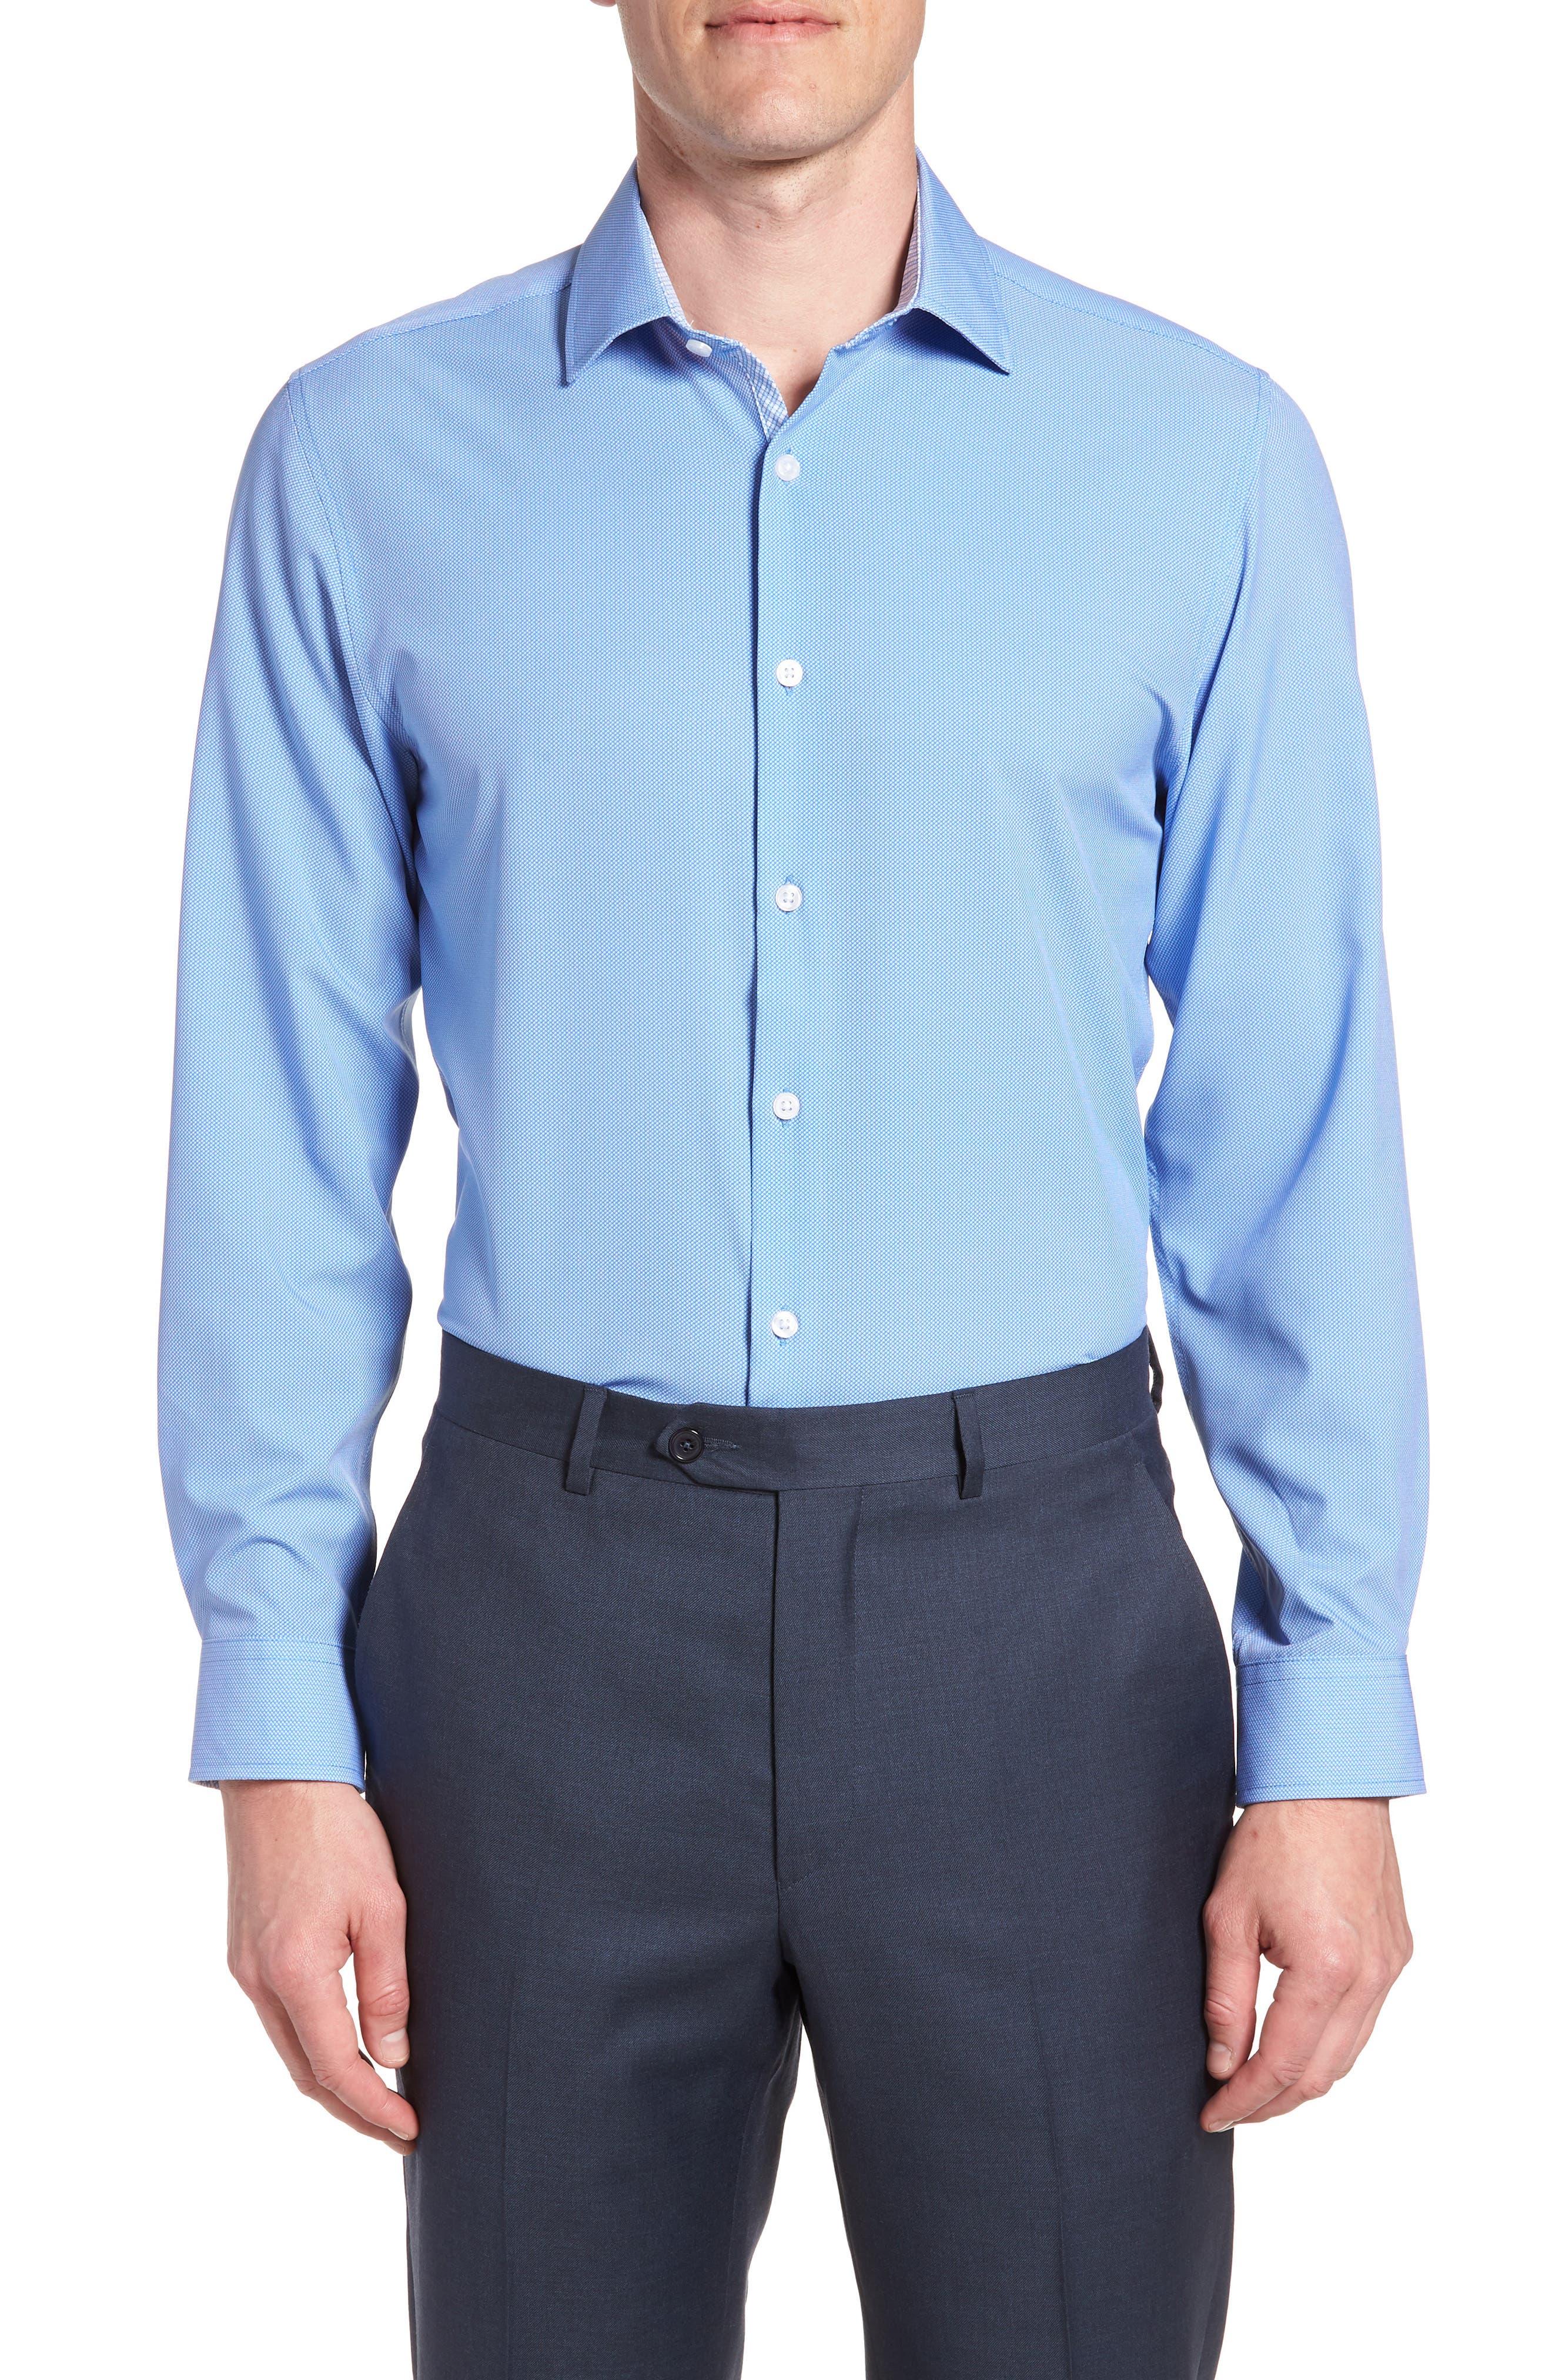 Trim Fit 4-Way Stretch Dress Shirt,                         Main,                         color, NAVY